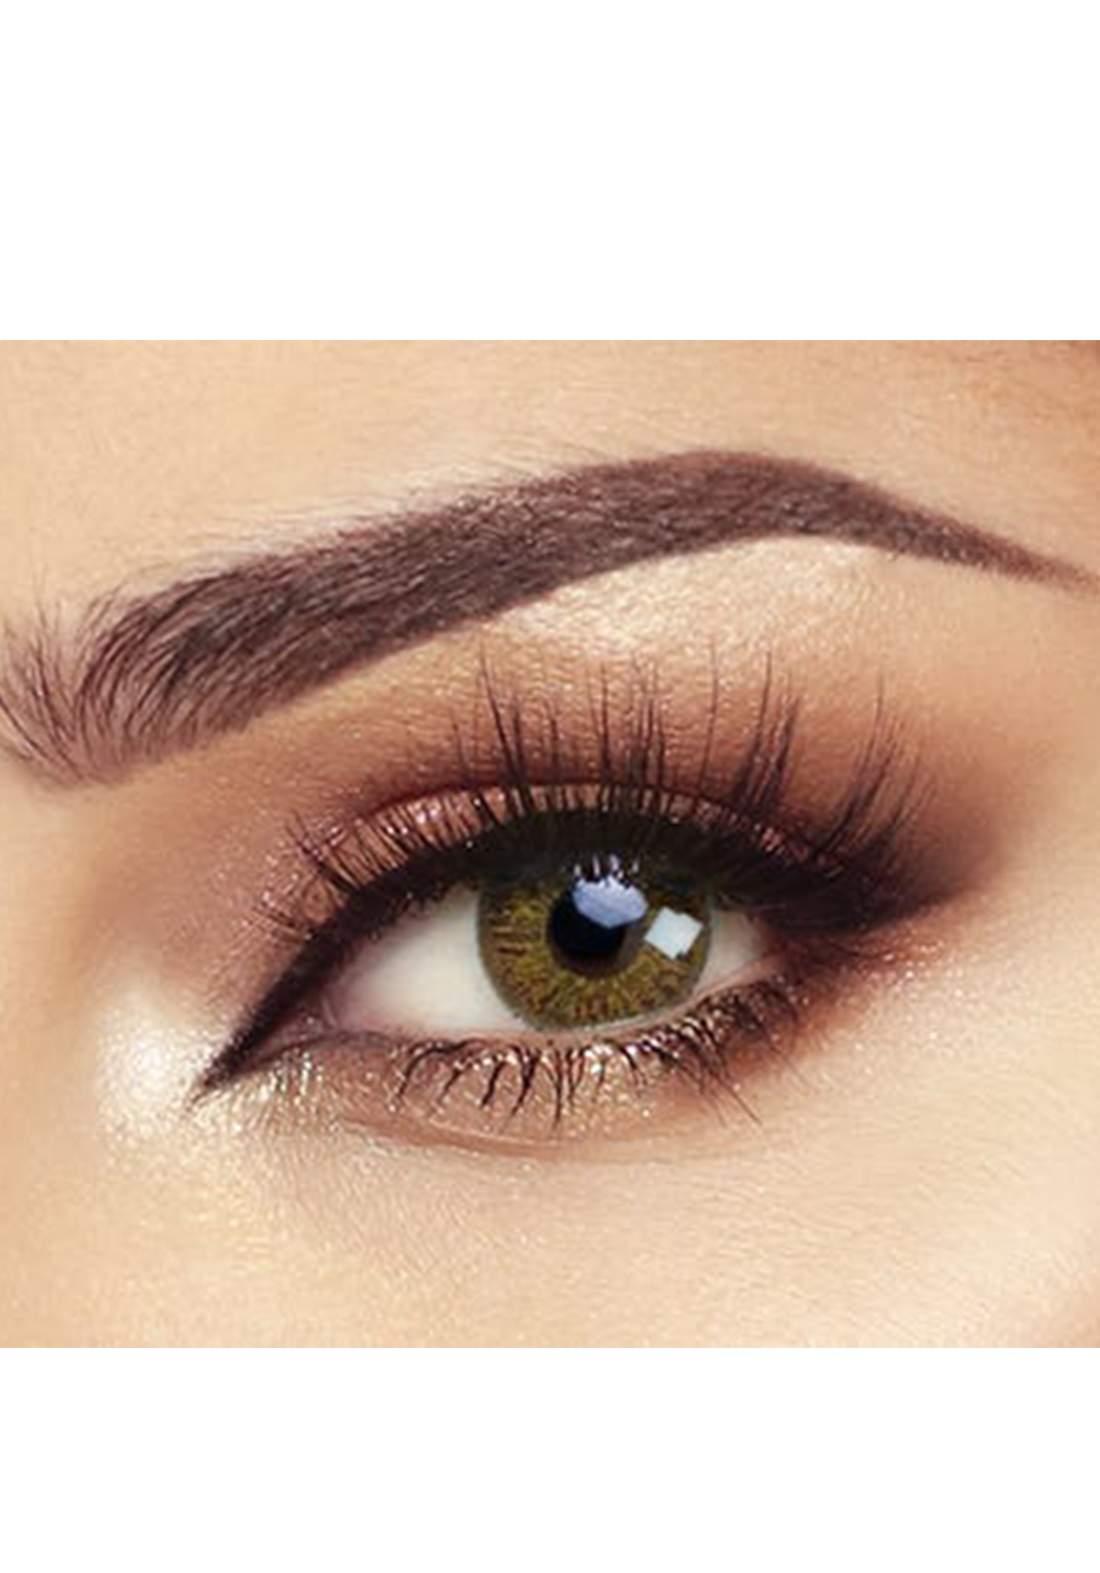 Bella Classic 301027 Contact Lenses 3 Months Use Natural - Cool Hazel No.28 عدسات لاصقة